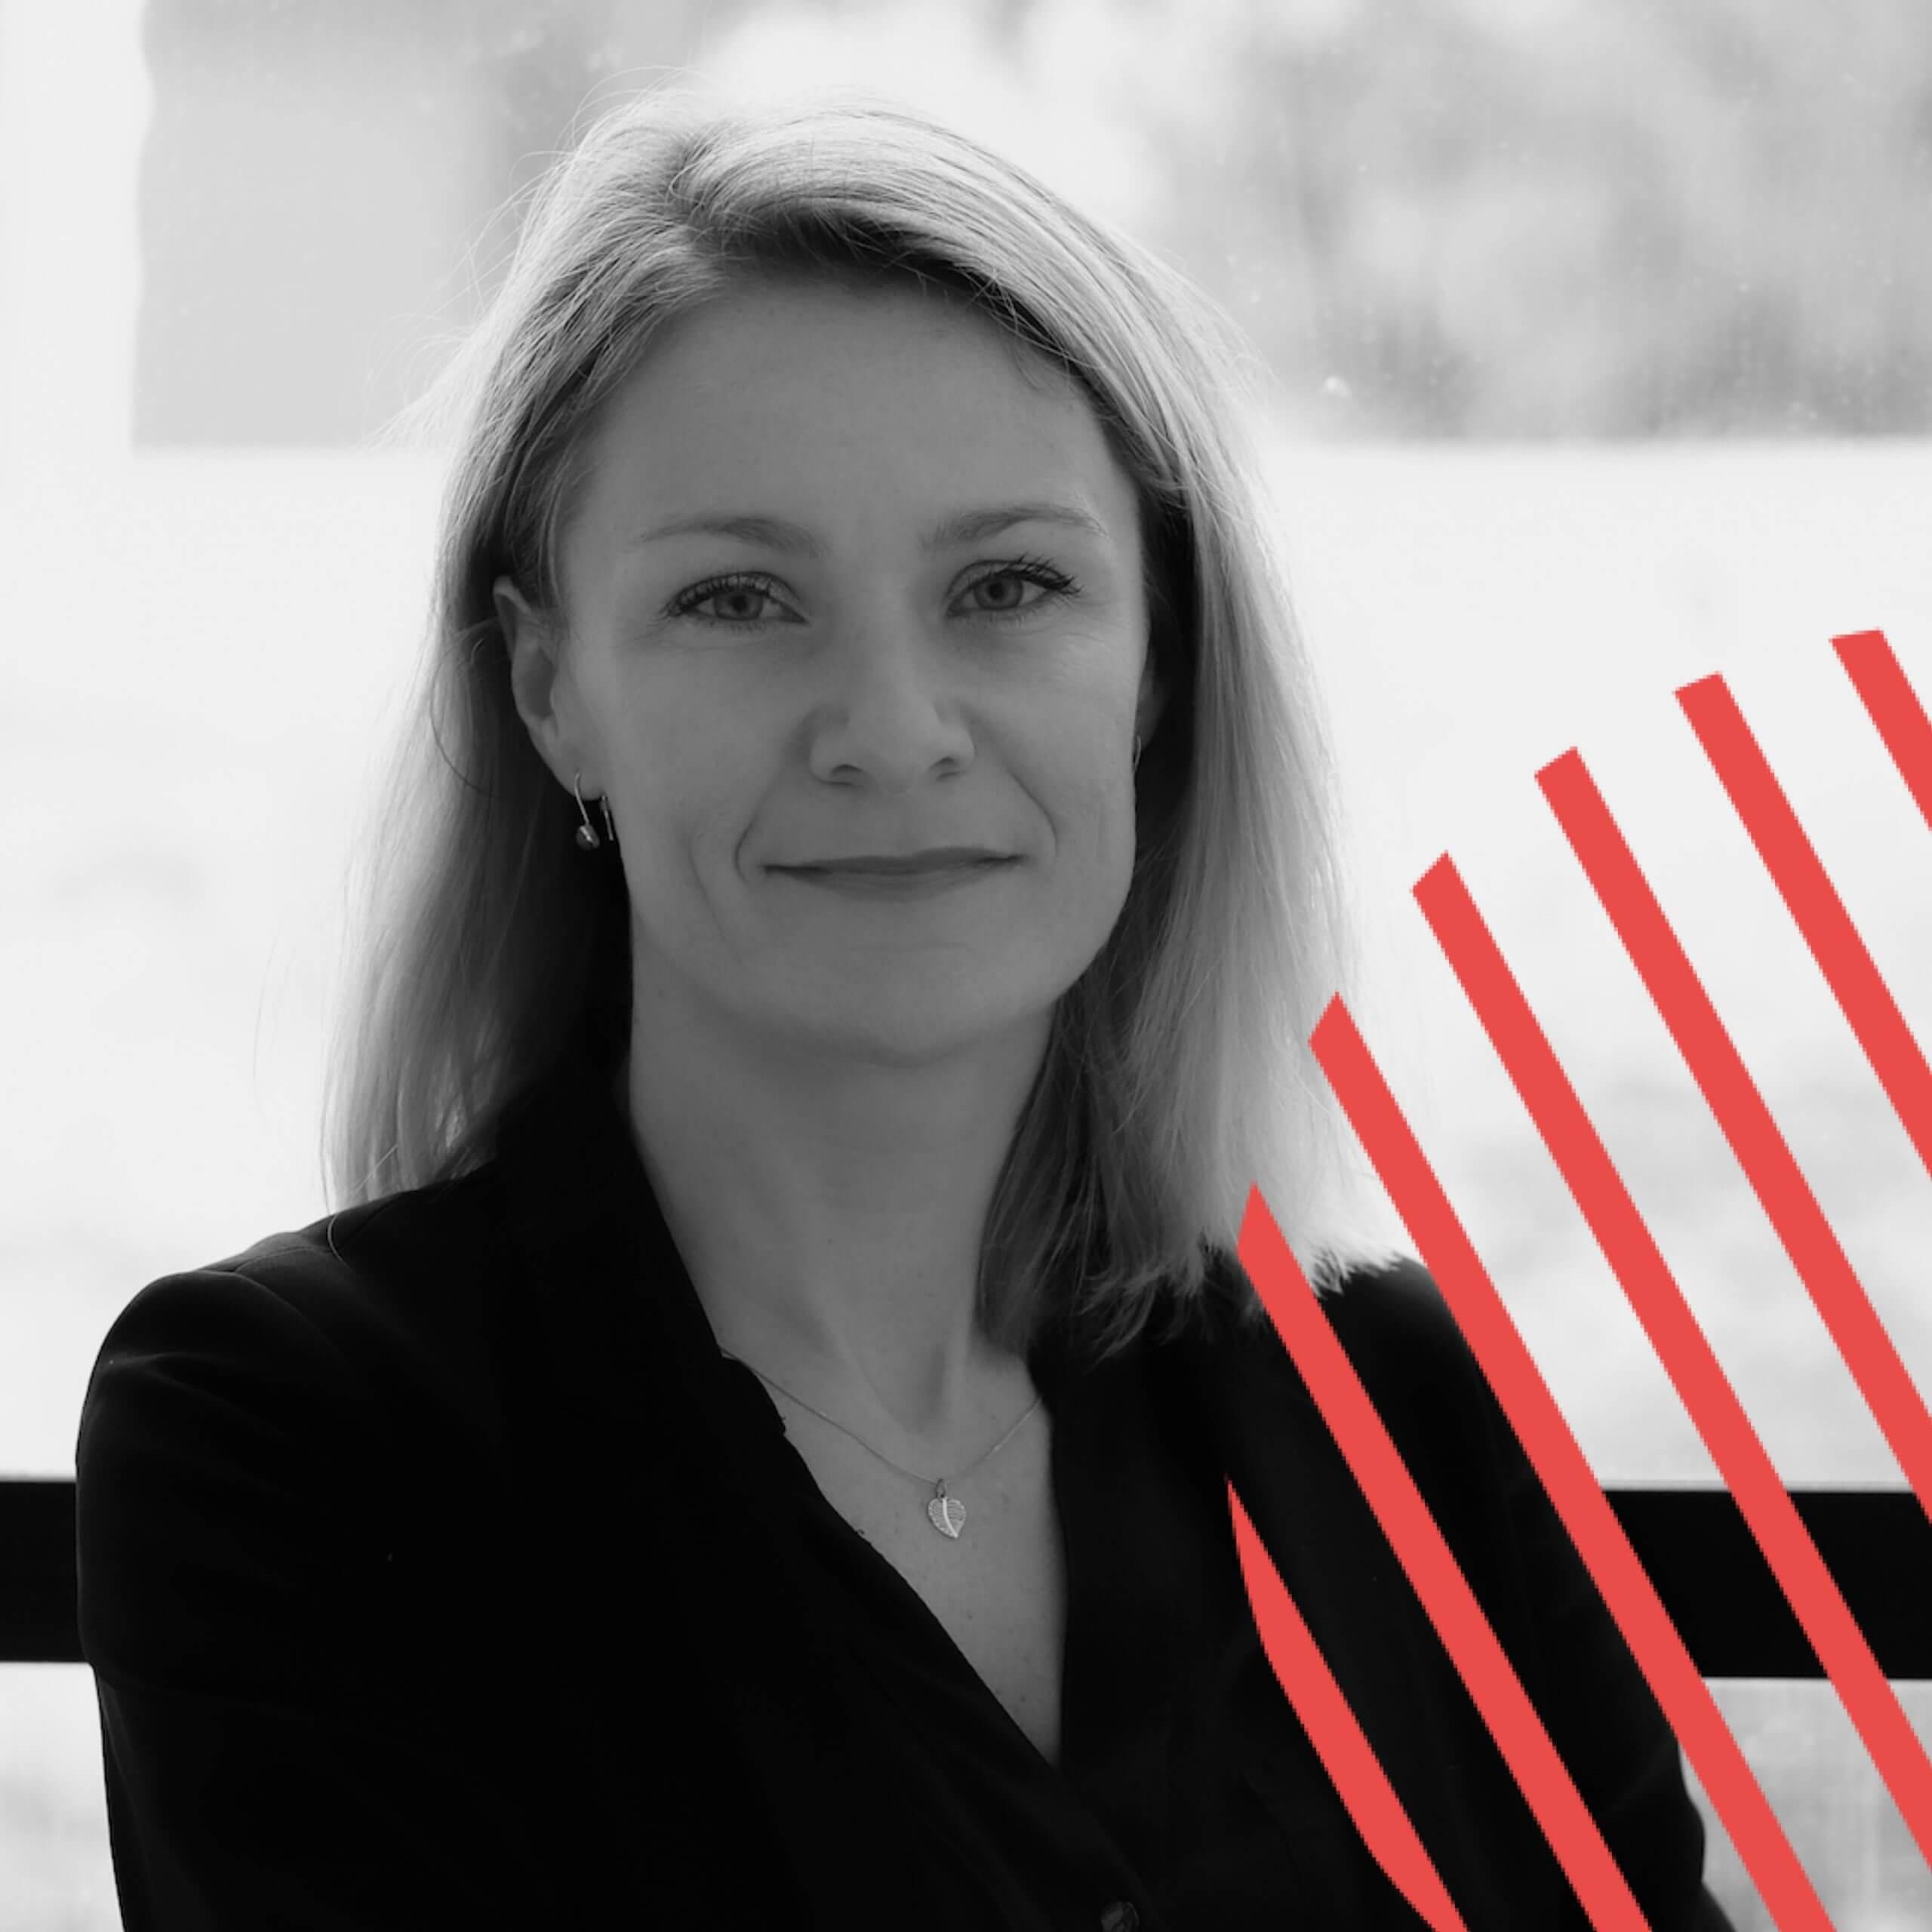 Leonie Rotermundt